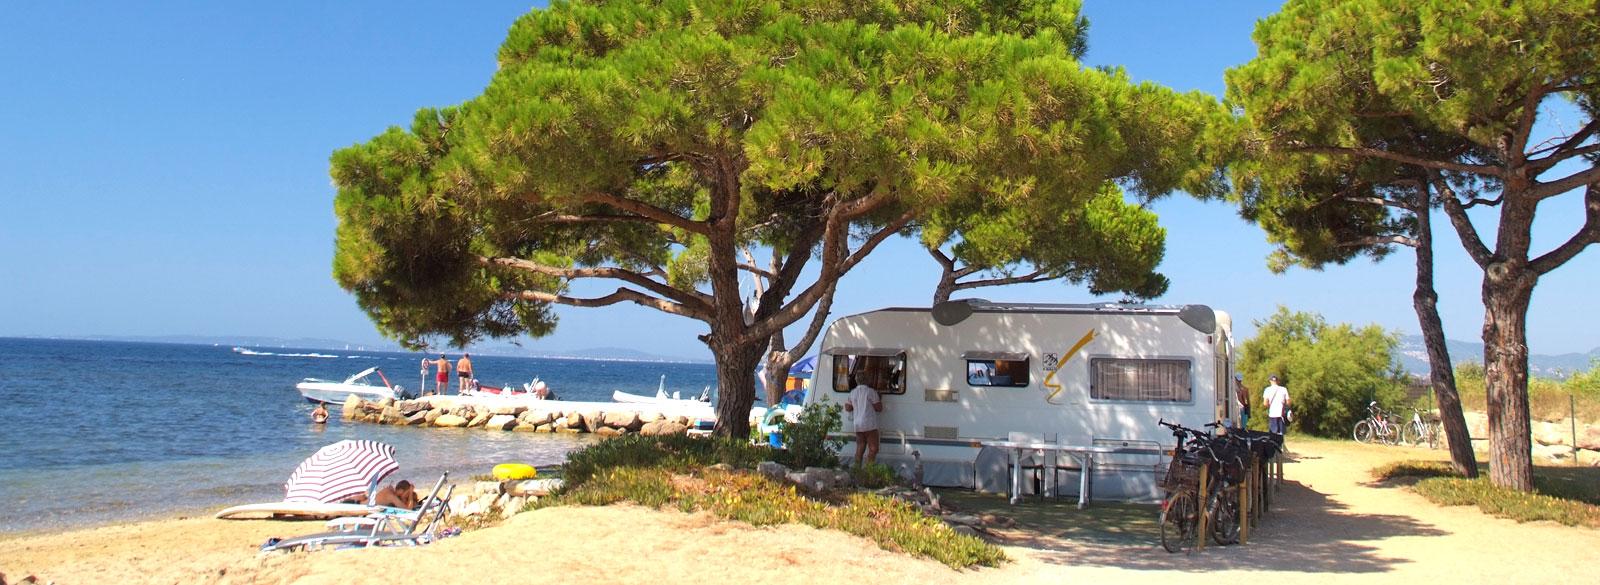 campingplatz la londe des maures